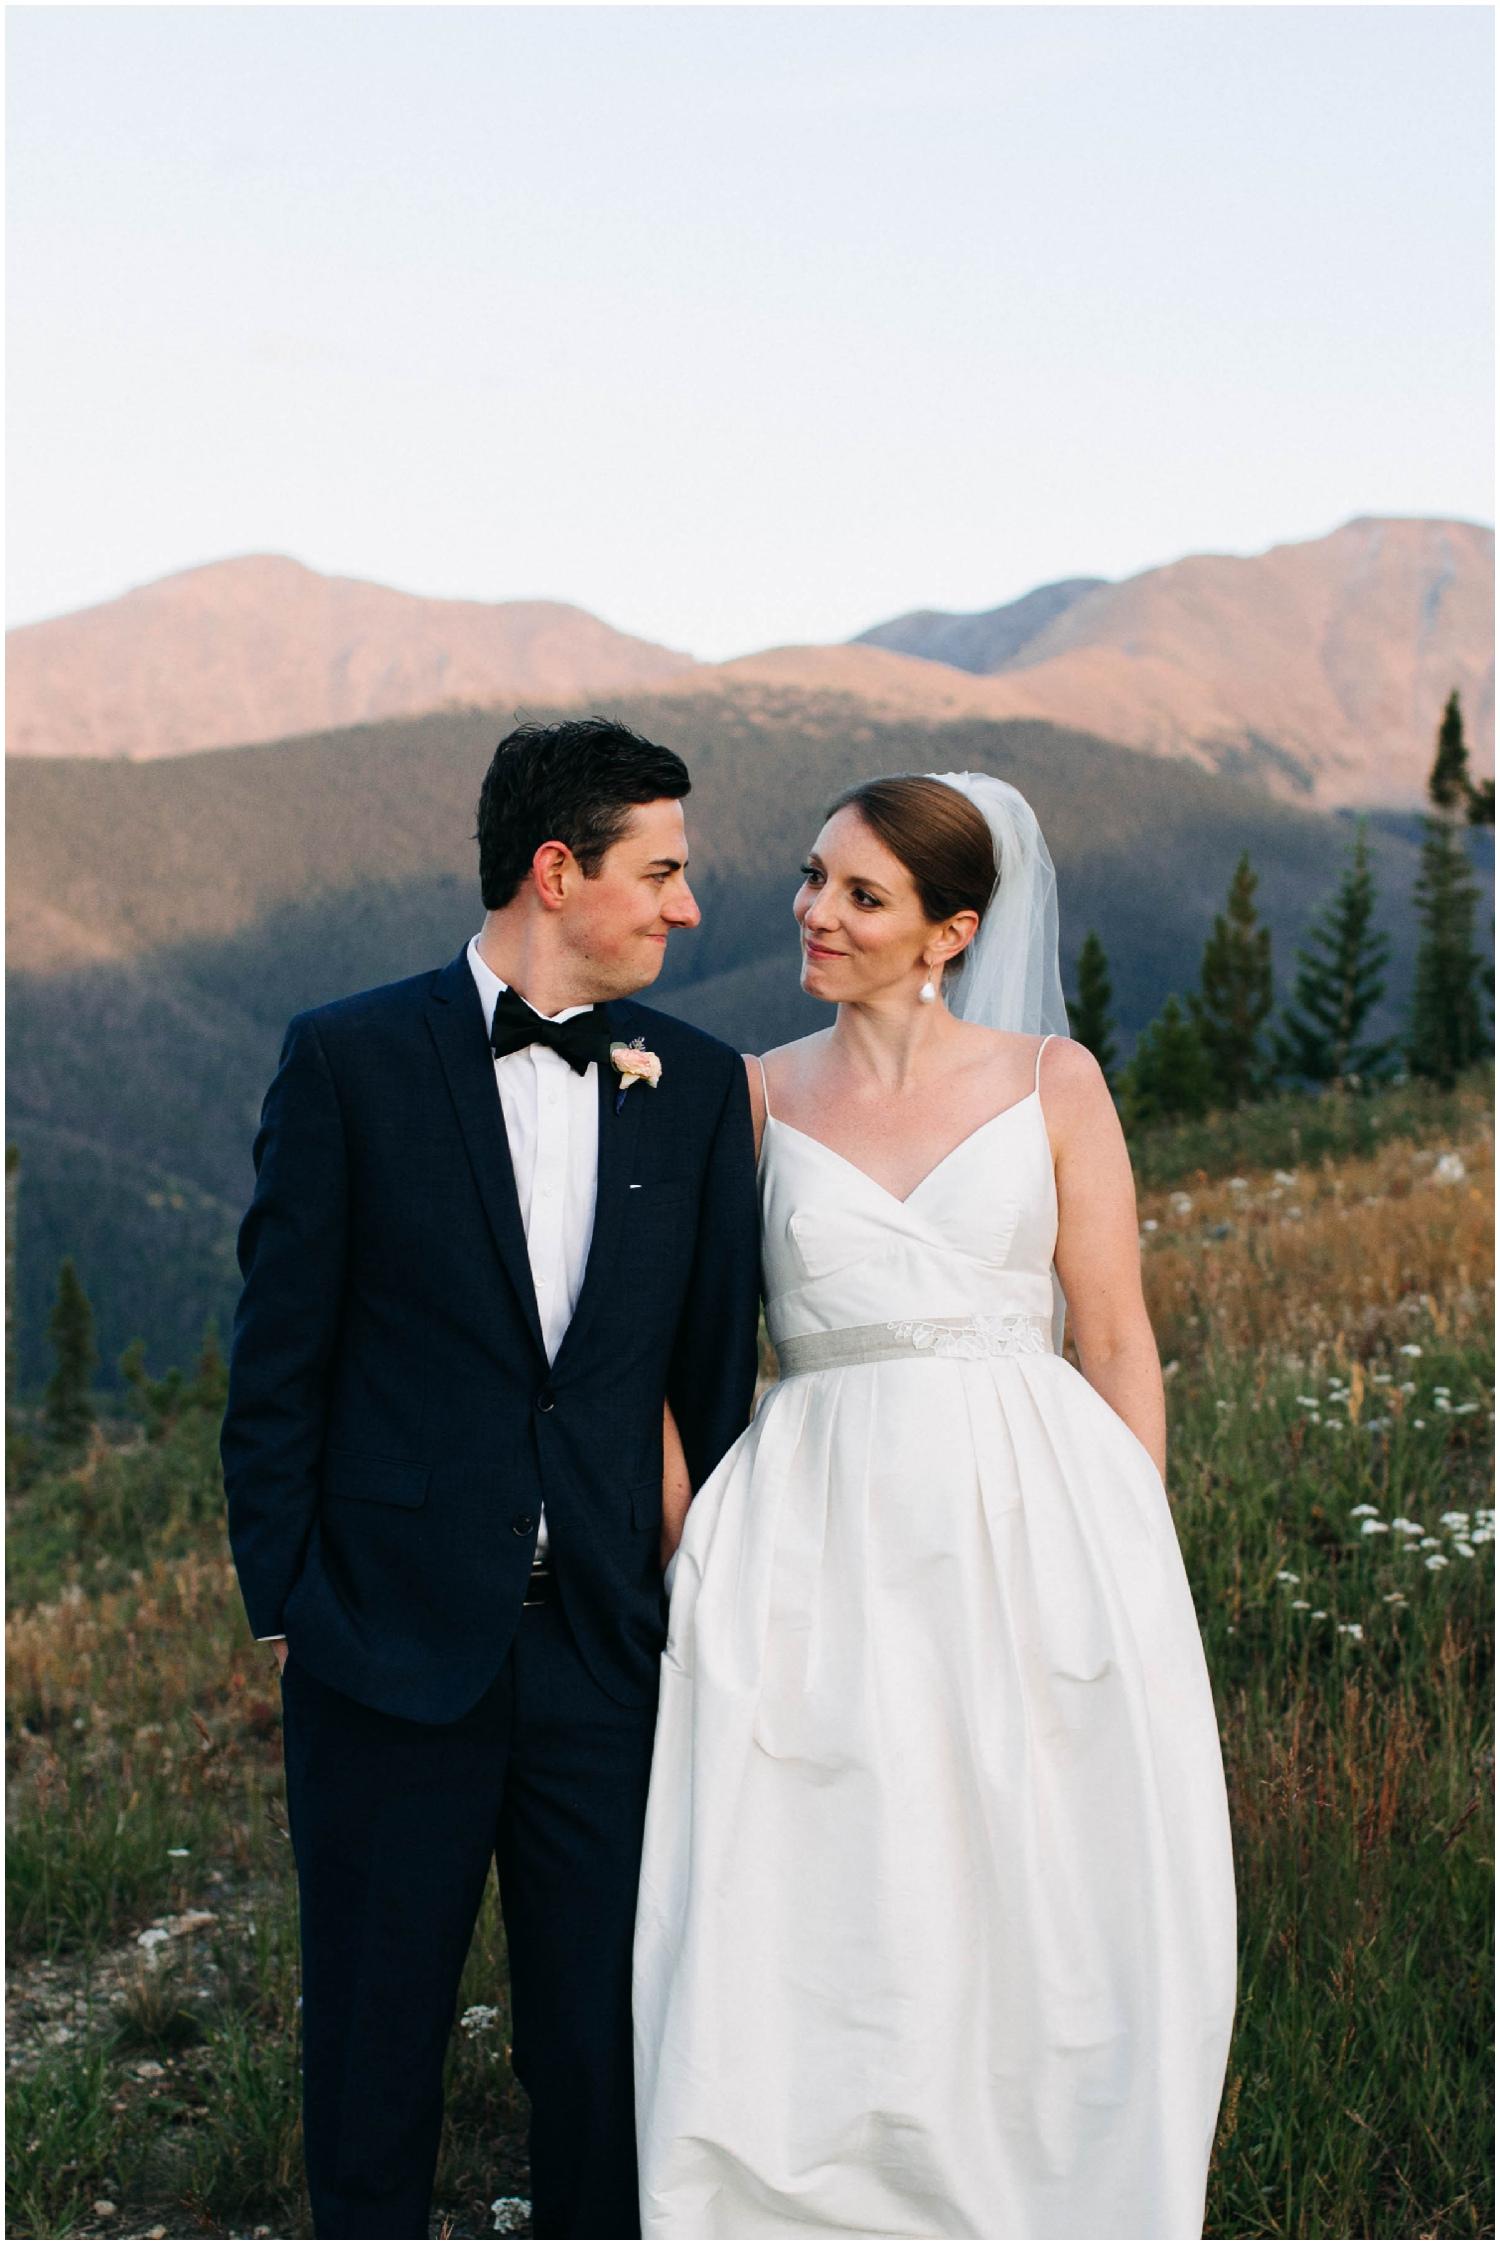 NadegeandJoe_elegant_winter_park_wedding_lodge_at_sunspot_mountain_taylor_powers_0238.jpg